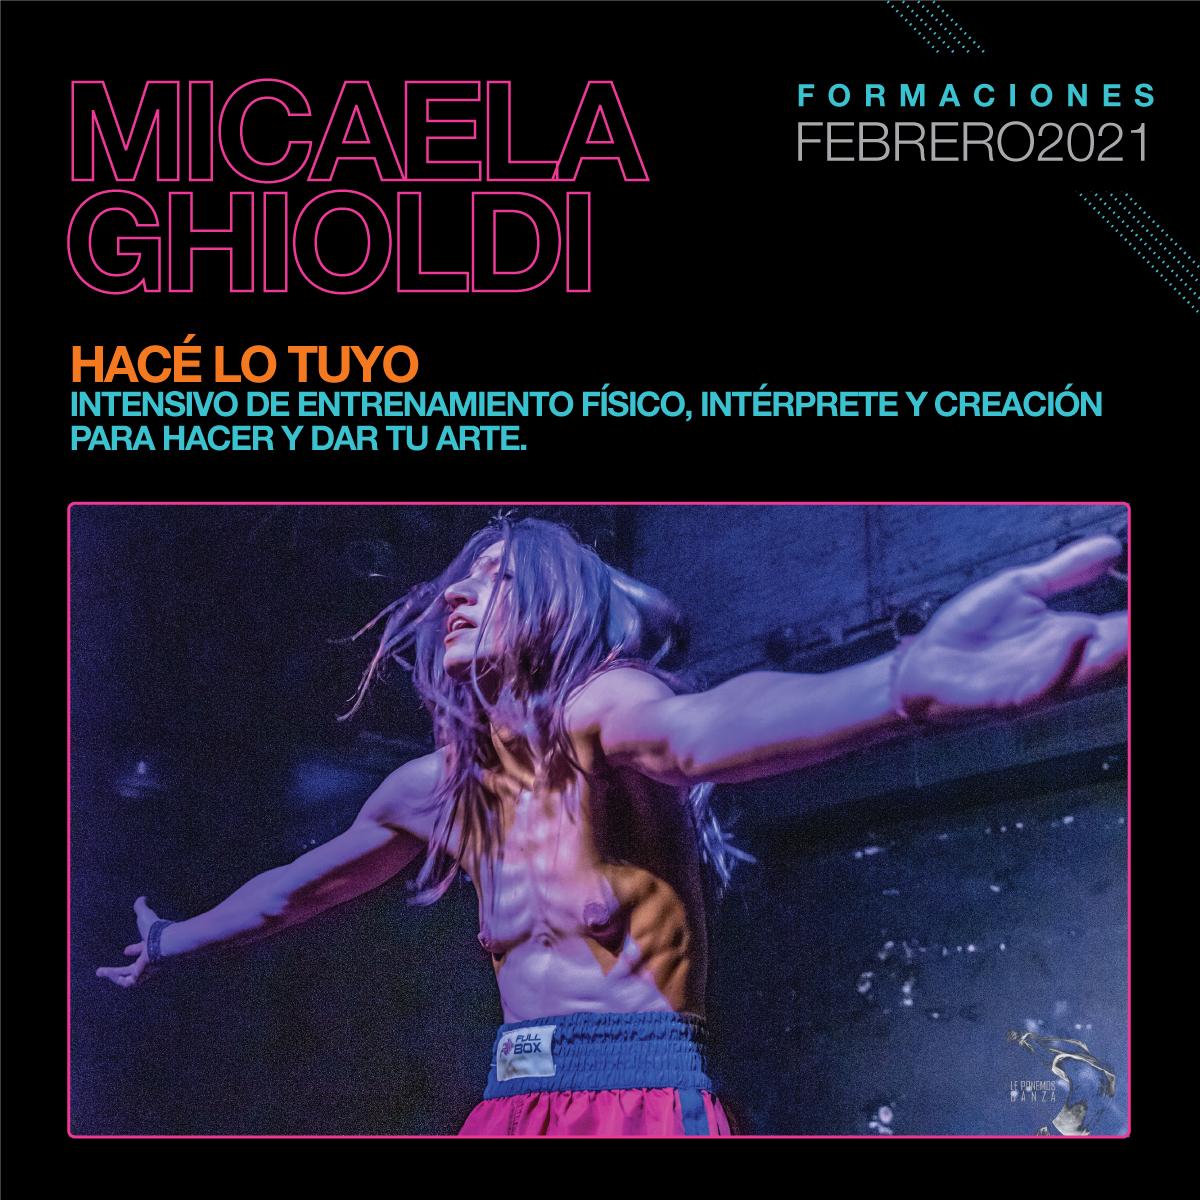 Micaela-Ghioldi-2021 Planta Inclan